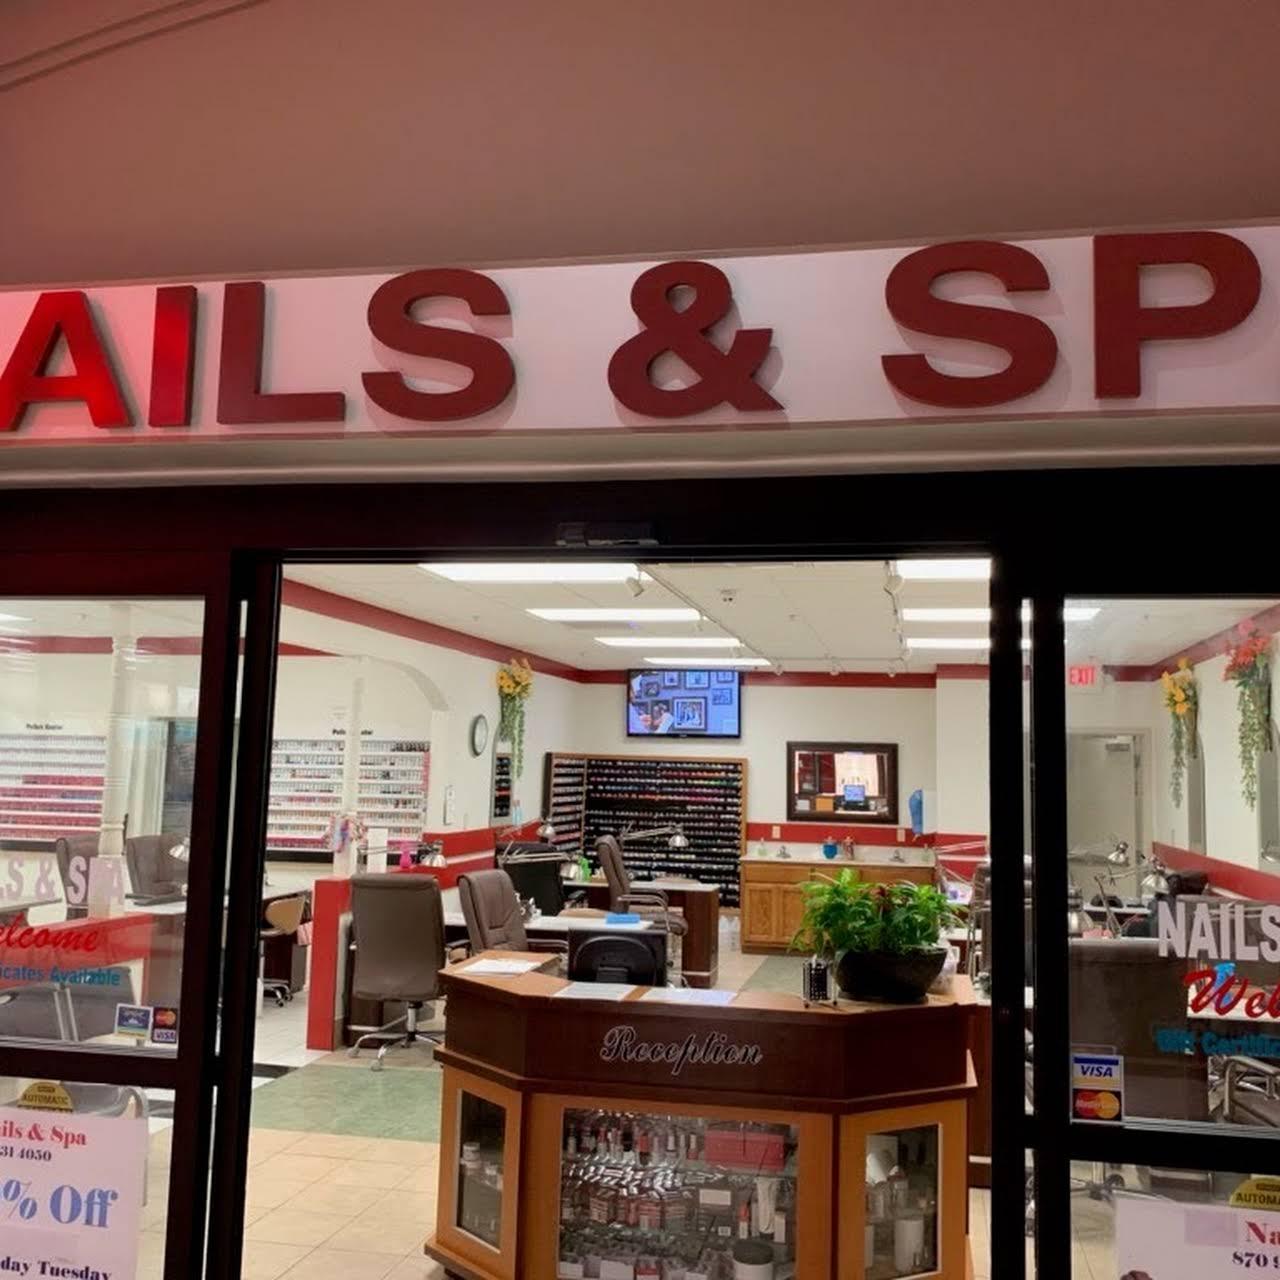 Lee Nails Spa In Jonesboro Nail Salon In Jonesboro